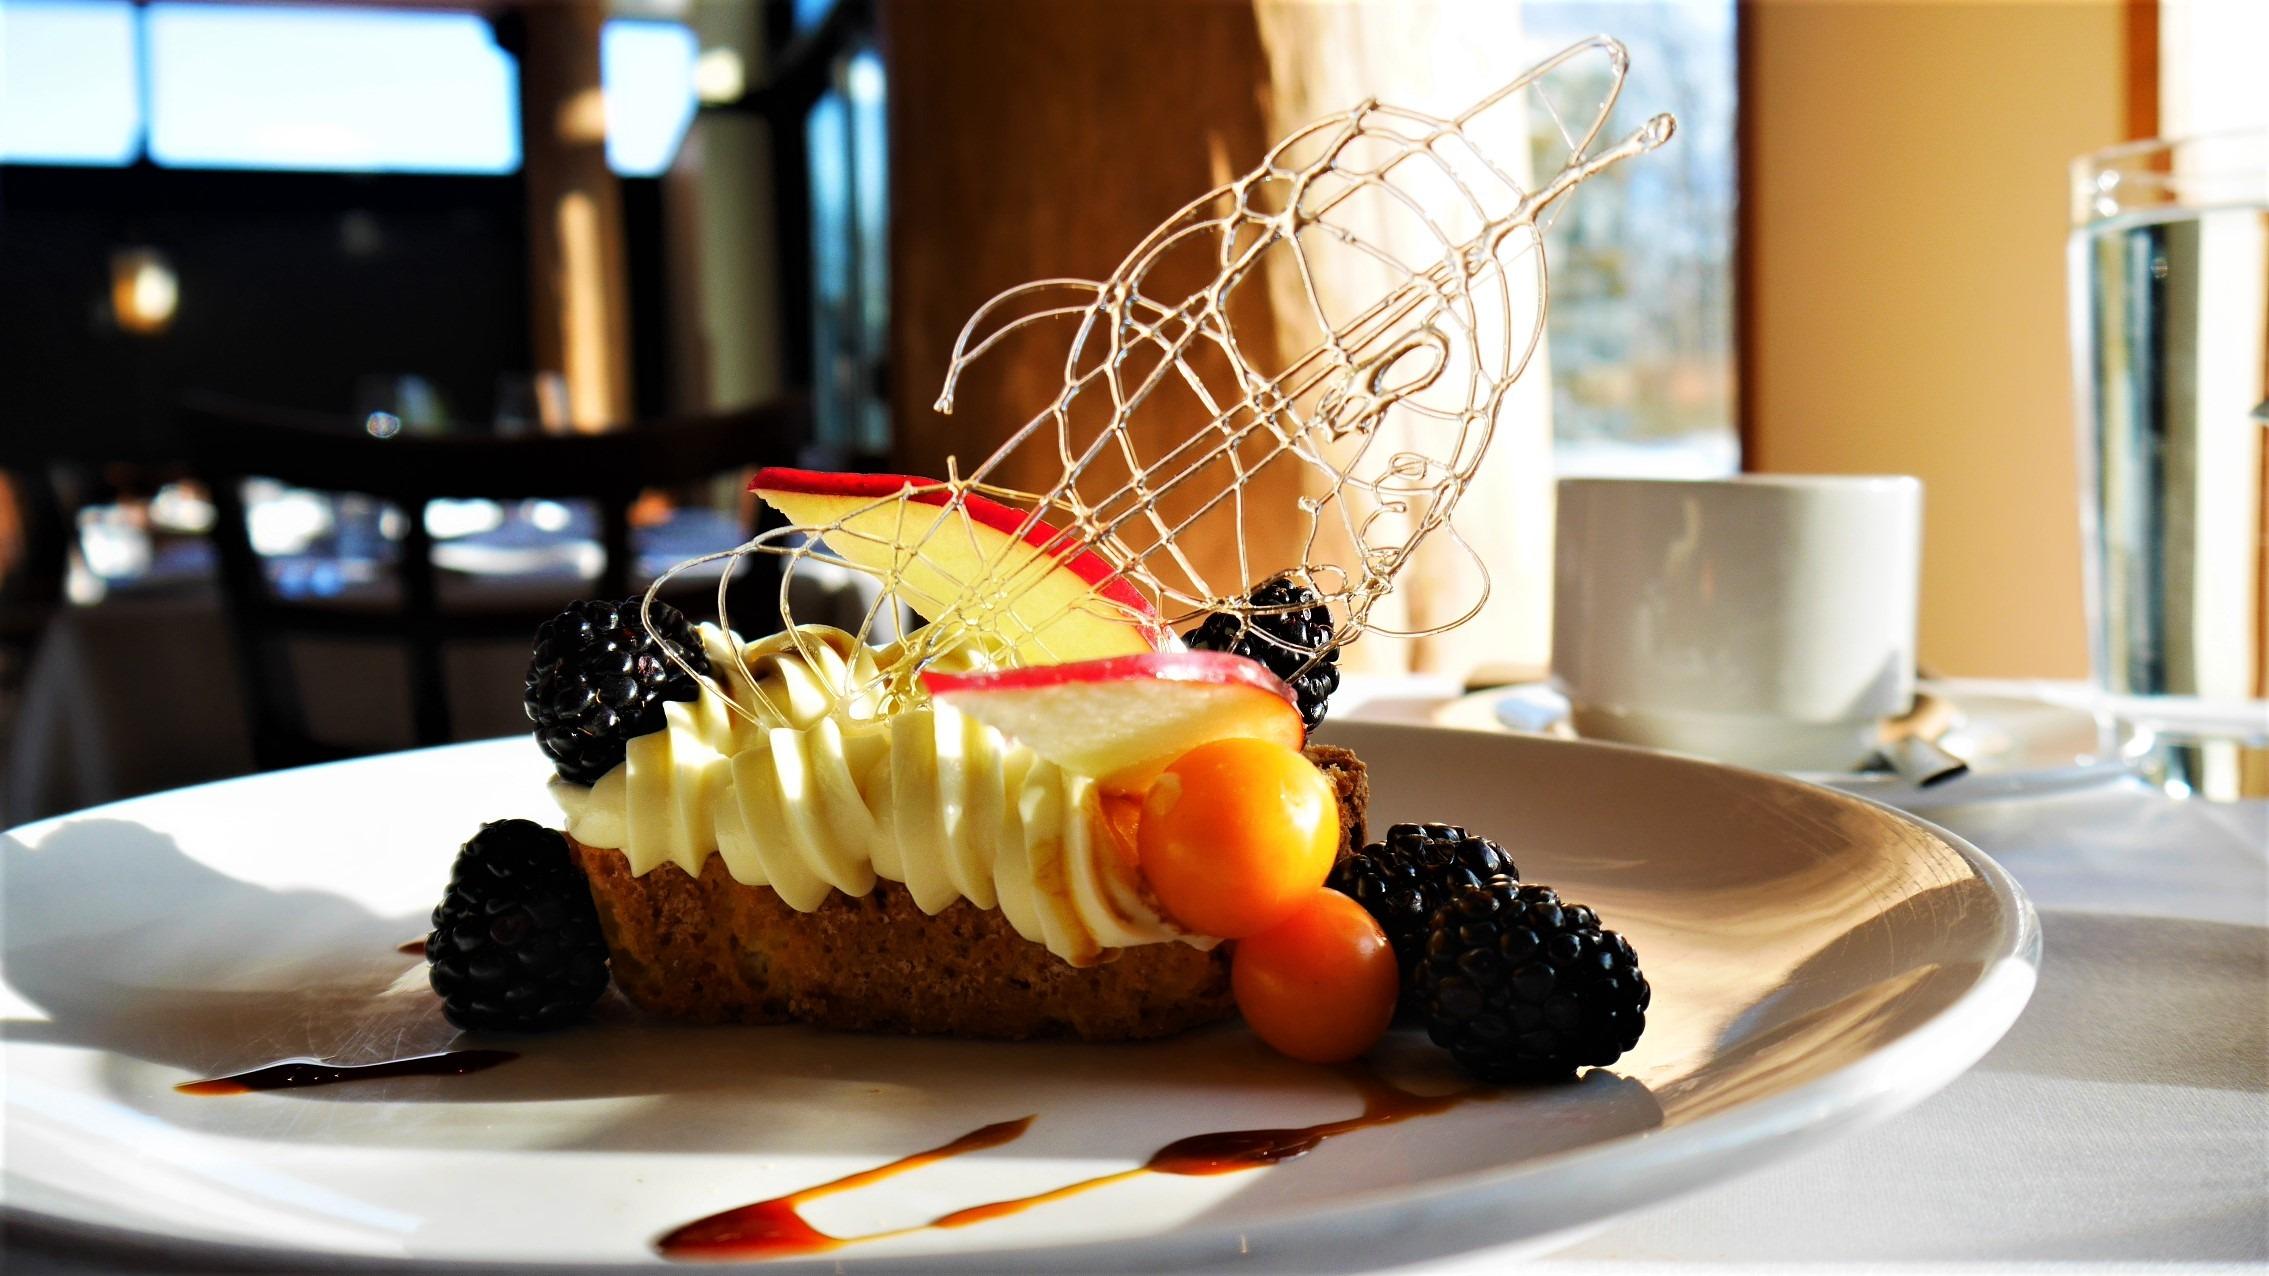 Wendake ou manger restaurant la traite blog voyage québec arpenter e chemin